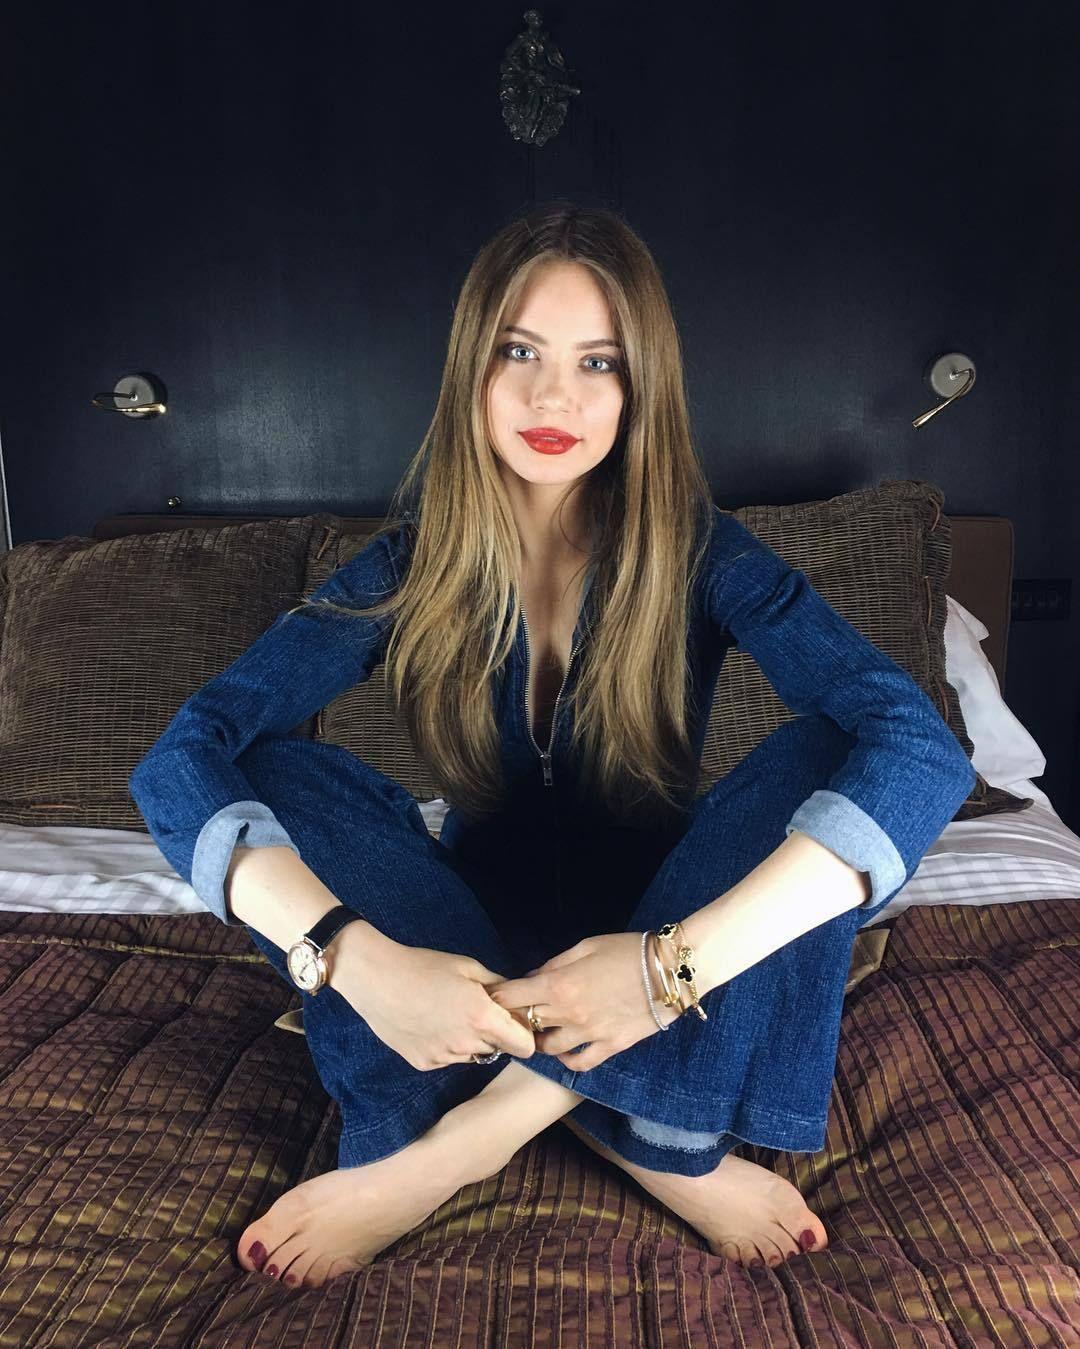 Pin Alex Gabriel Flared Jeans & Barefoot